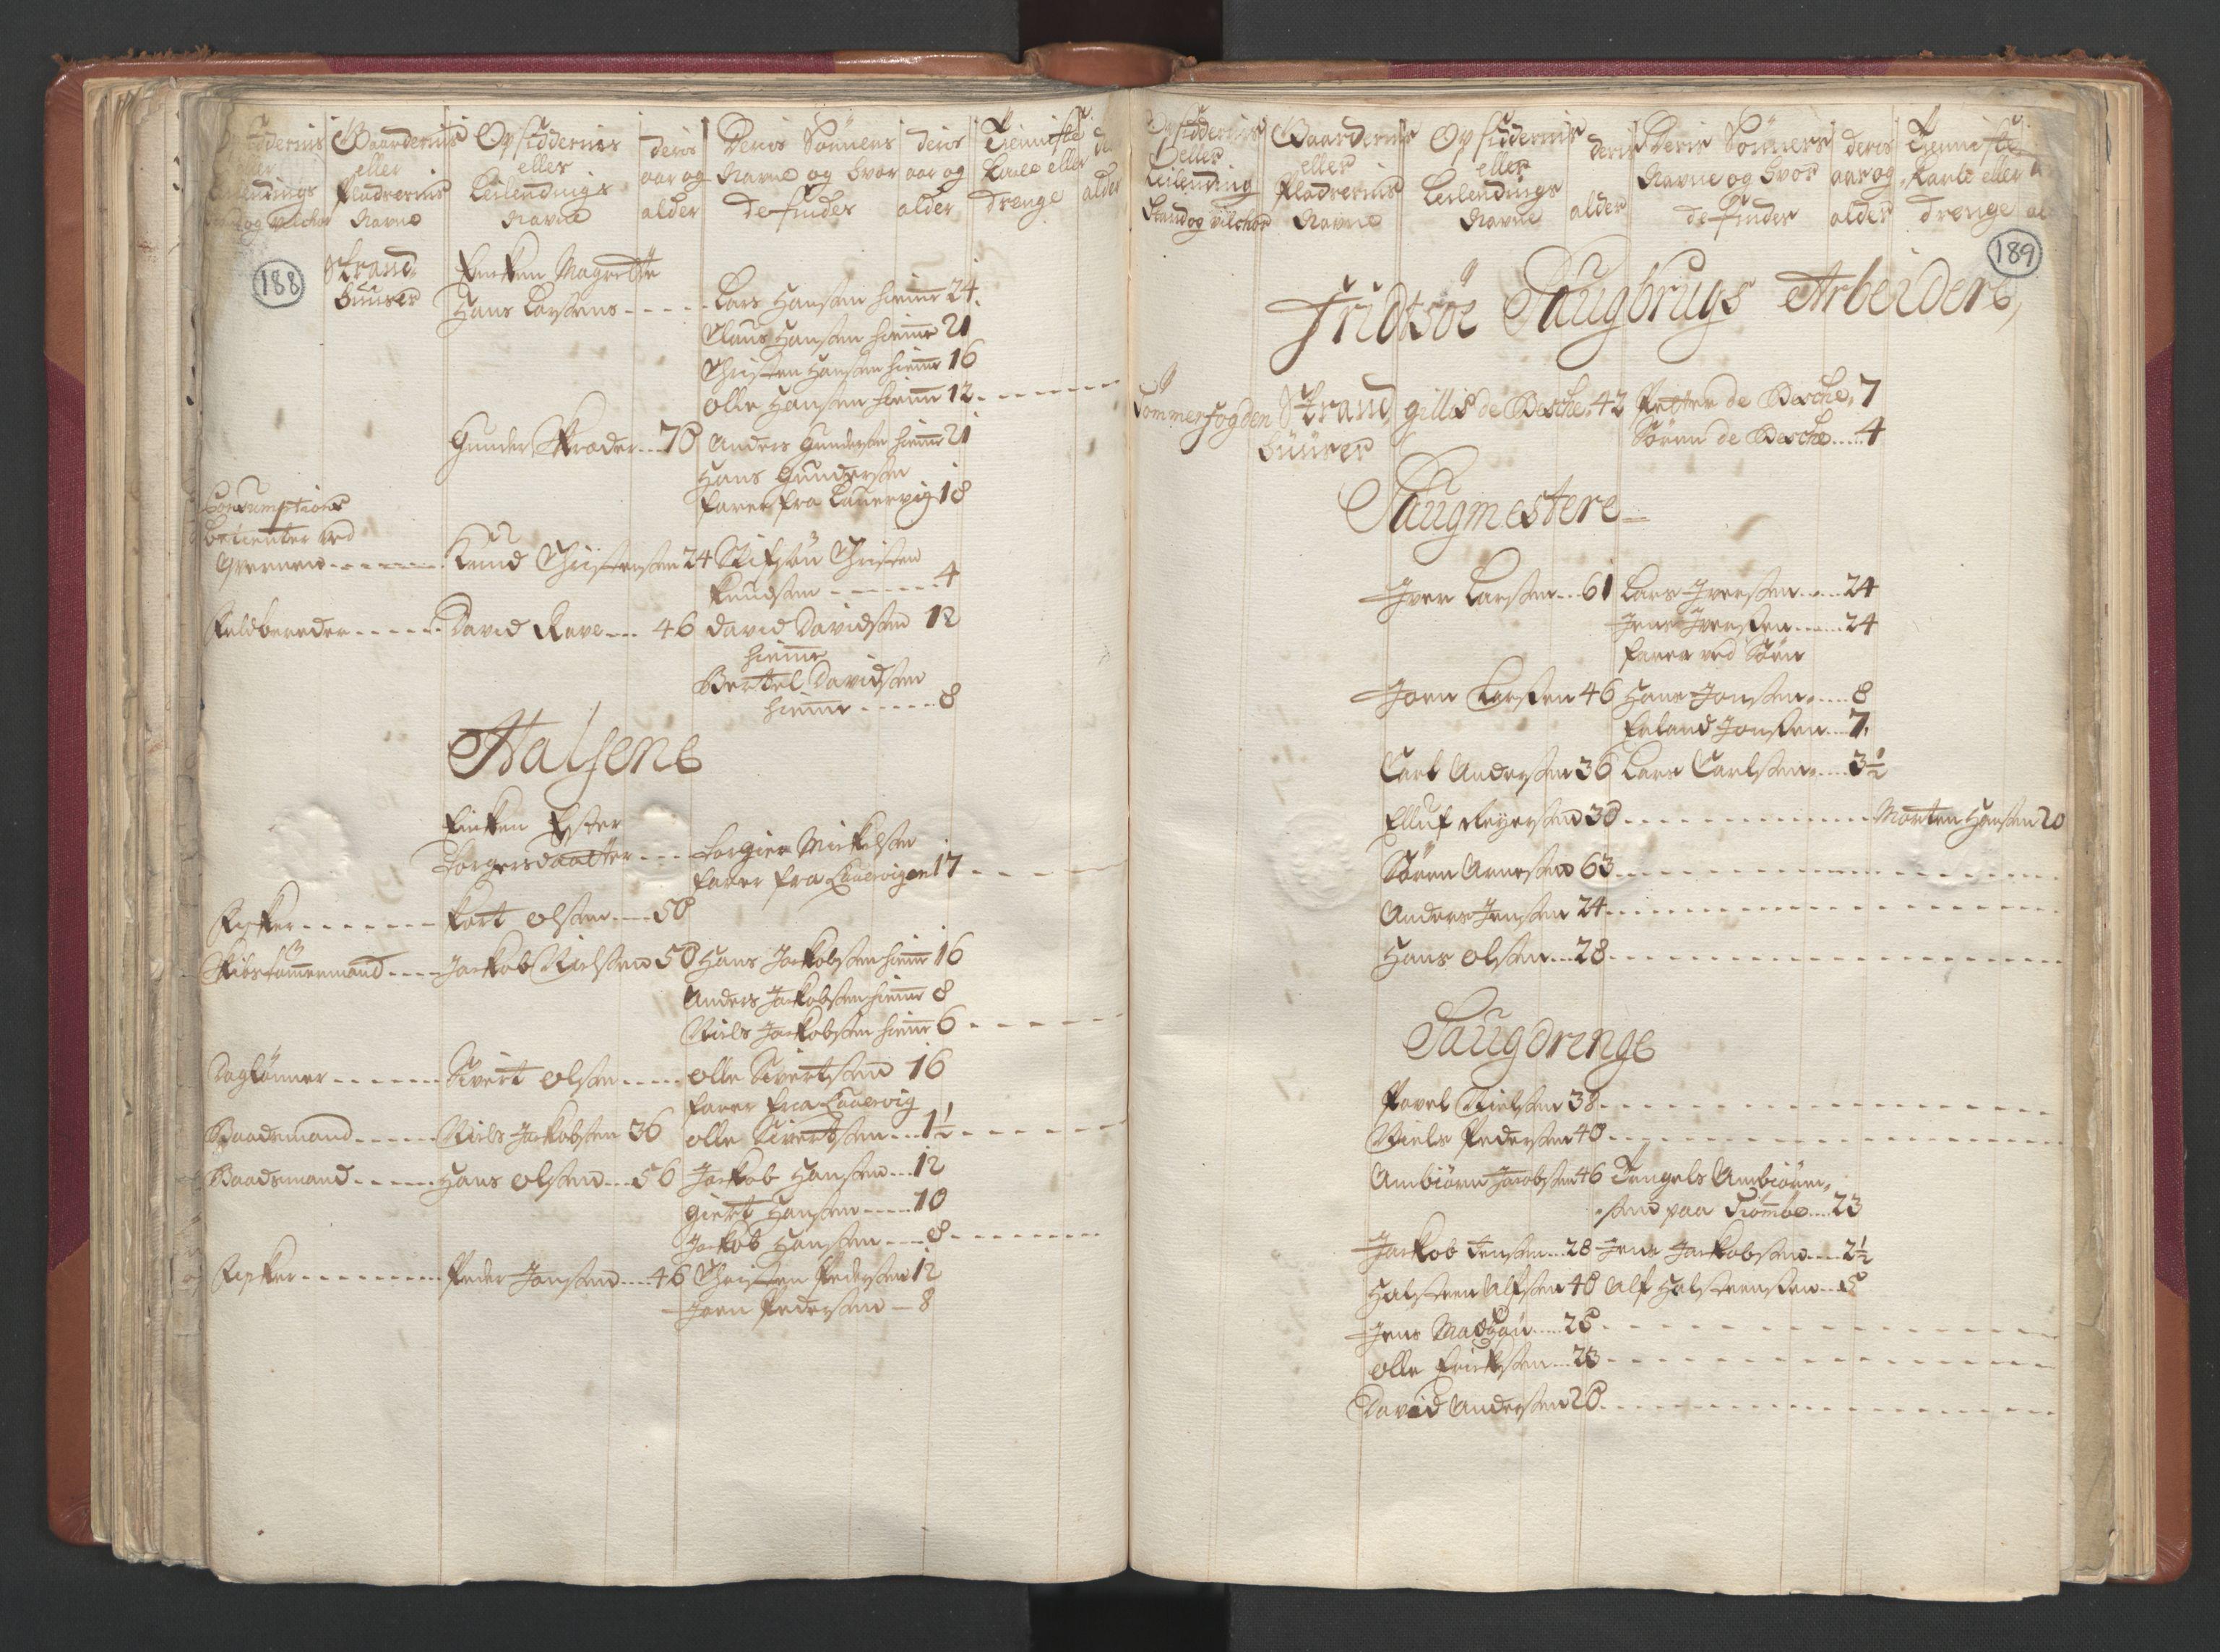 RA, Manntallet 1701, nr. 2: Solør, Odal og Østerdal fogderi og Larvik grevskap, 1701, s. 188-189